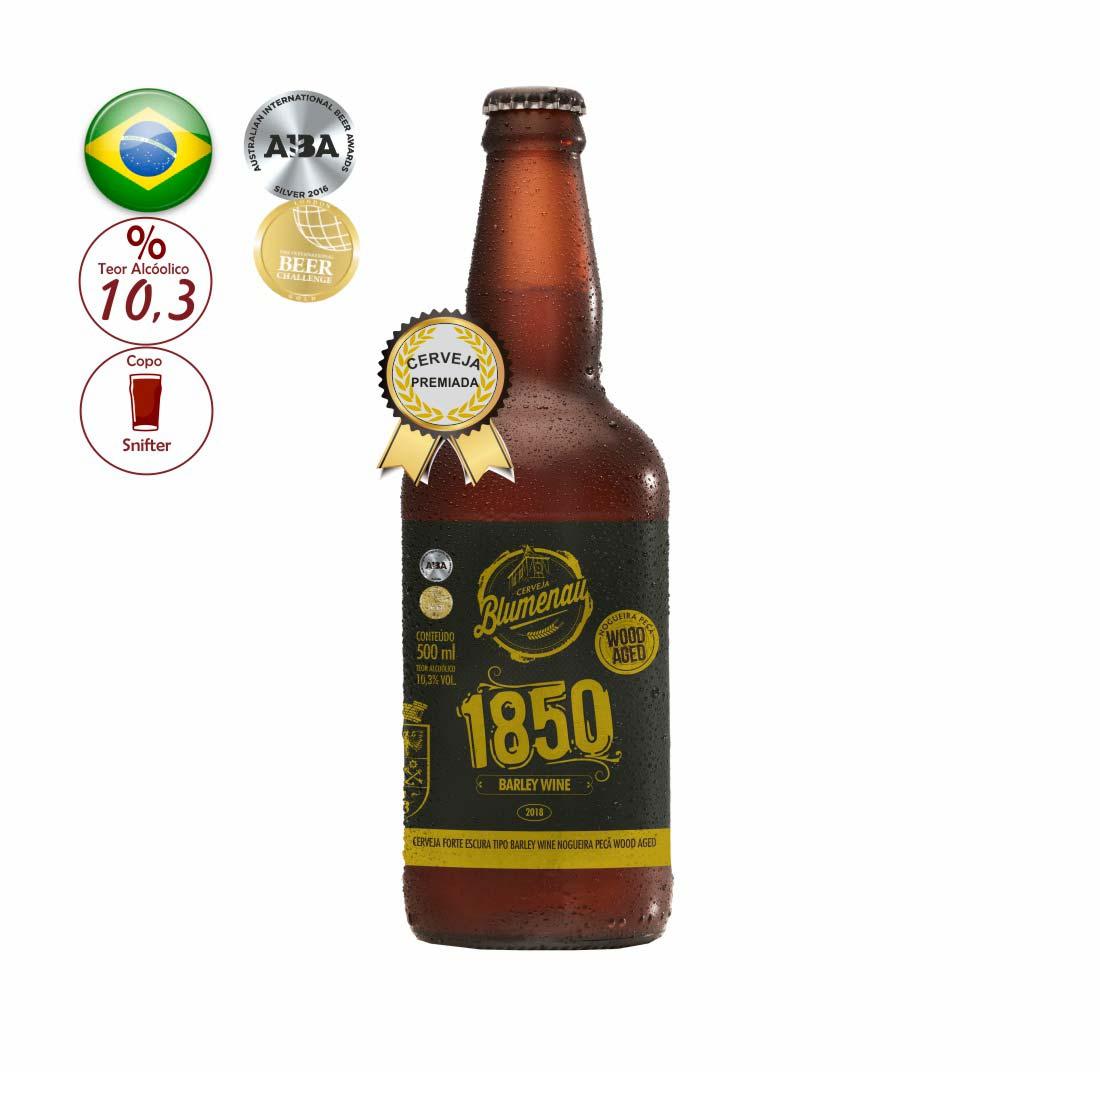 CERVEJA  BLUMENAU 500ML 1850 BARLEY WINE NOGUEIRA PECA WOOD AGED